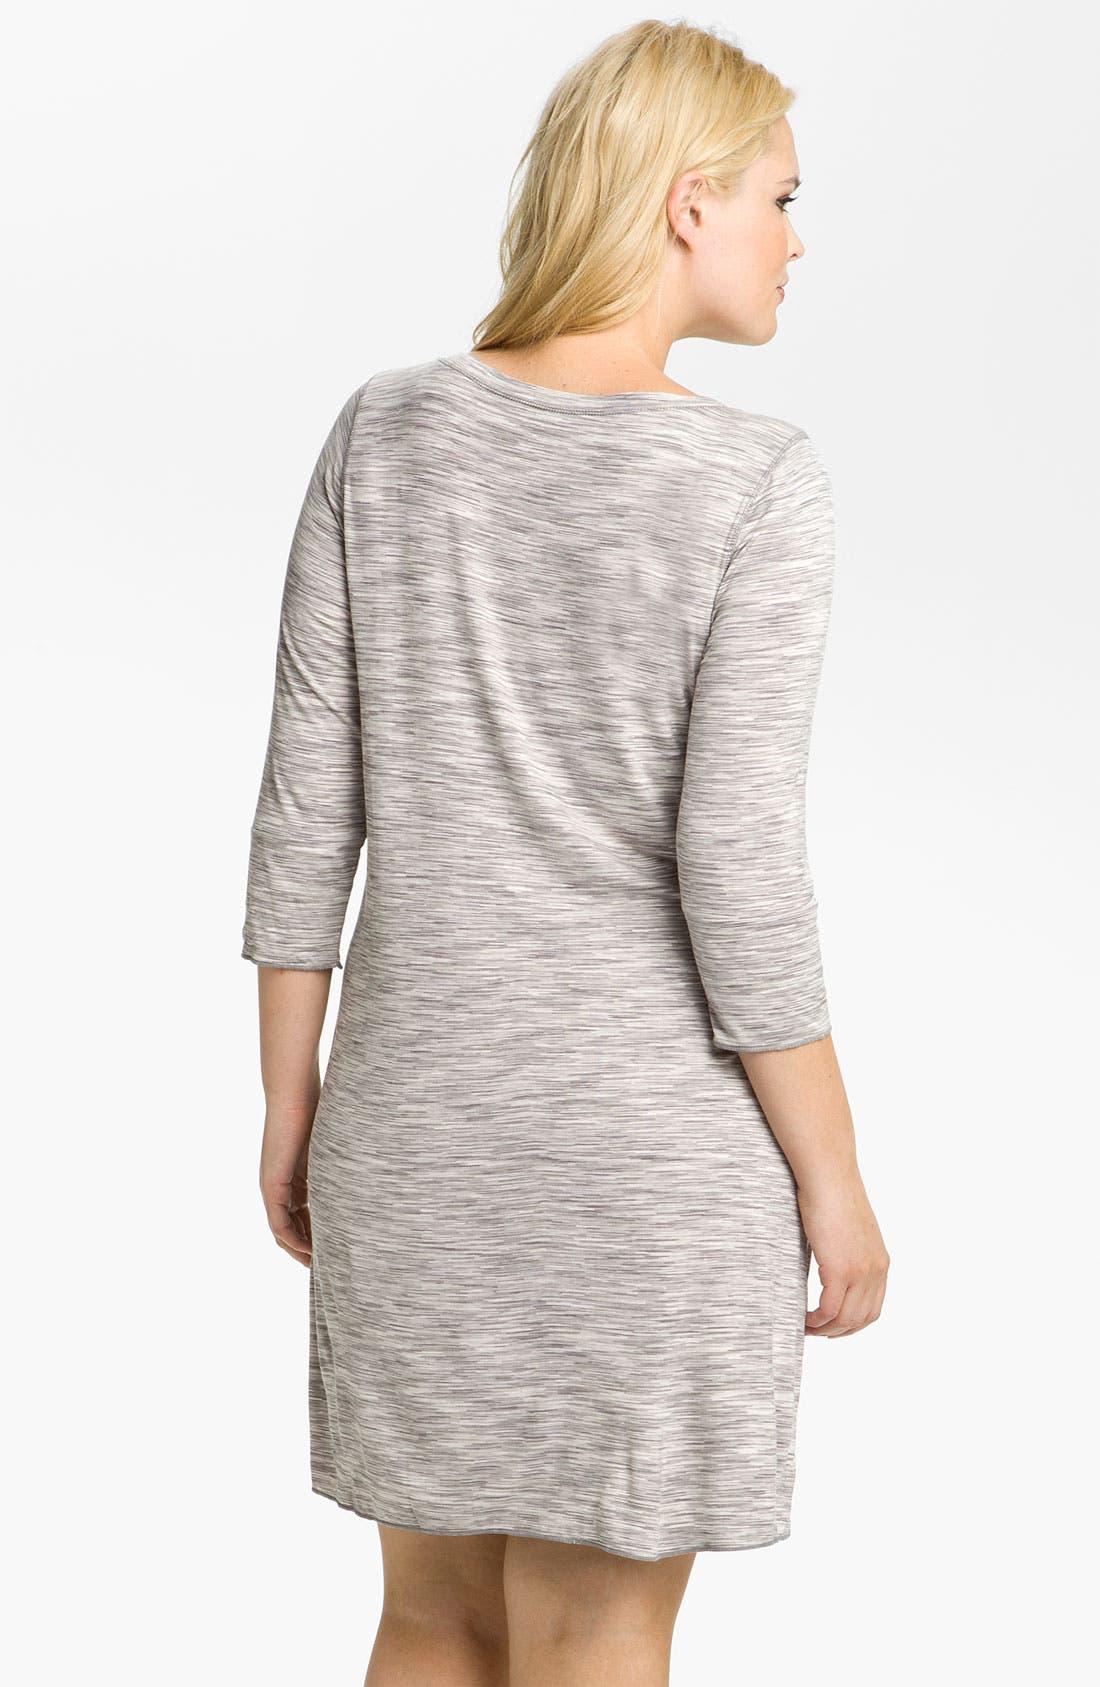 Alternate Image 2  - Hue Space Dye Sleep Shirt (Plus)